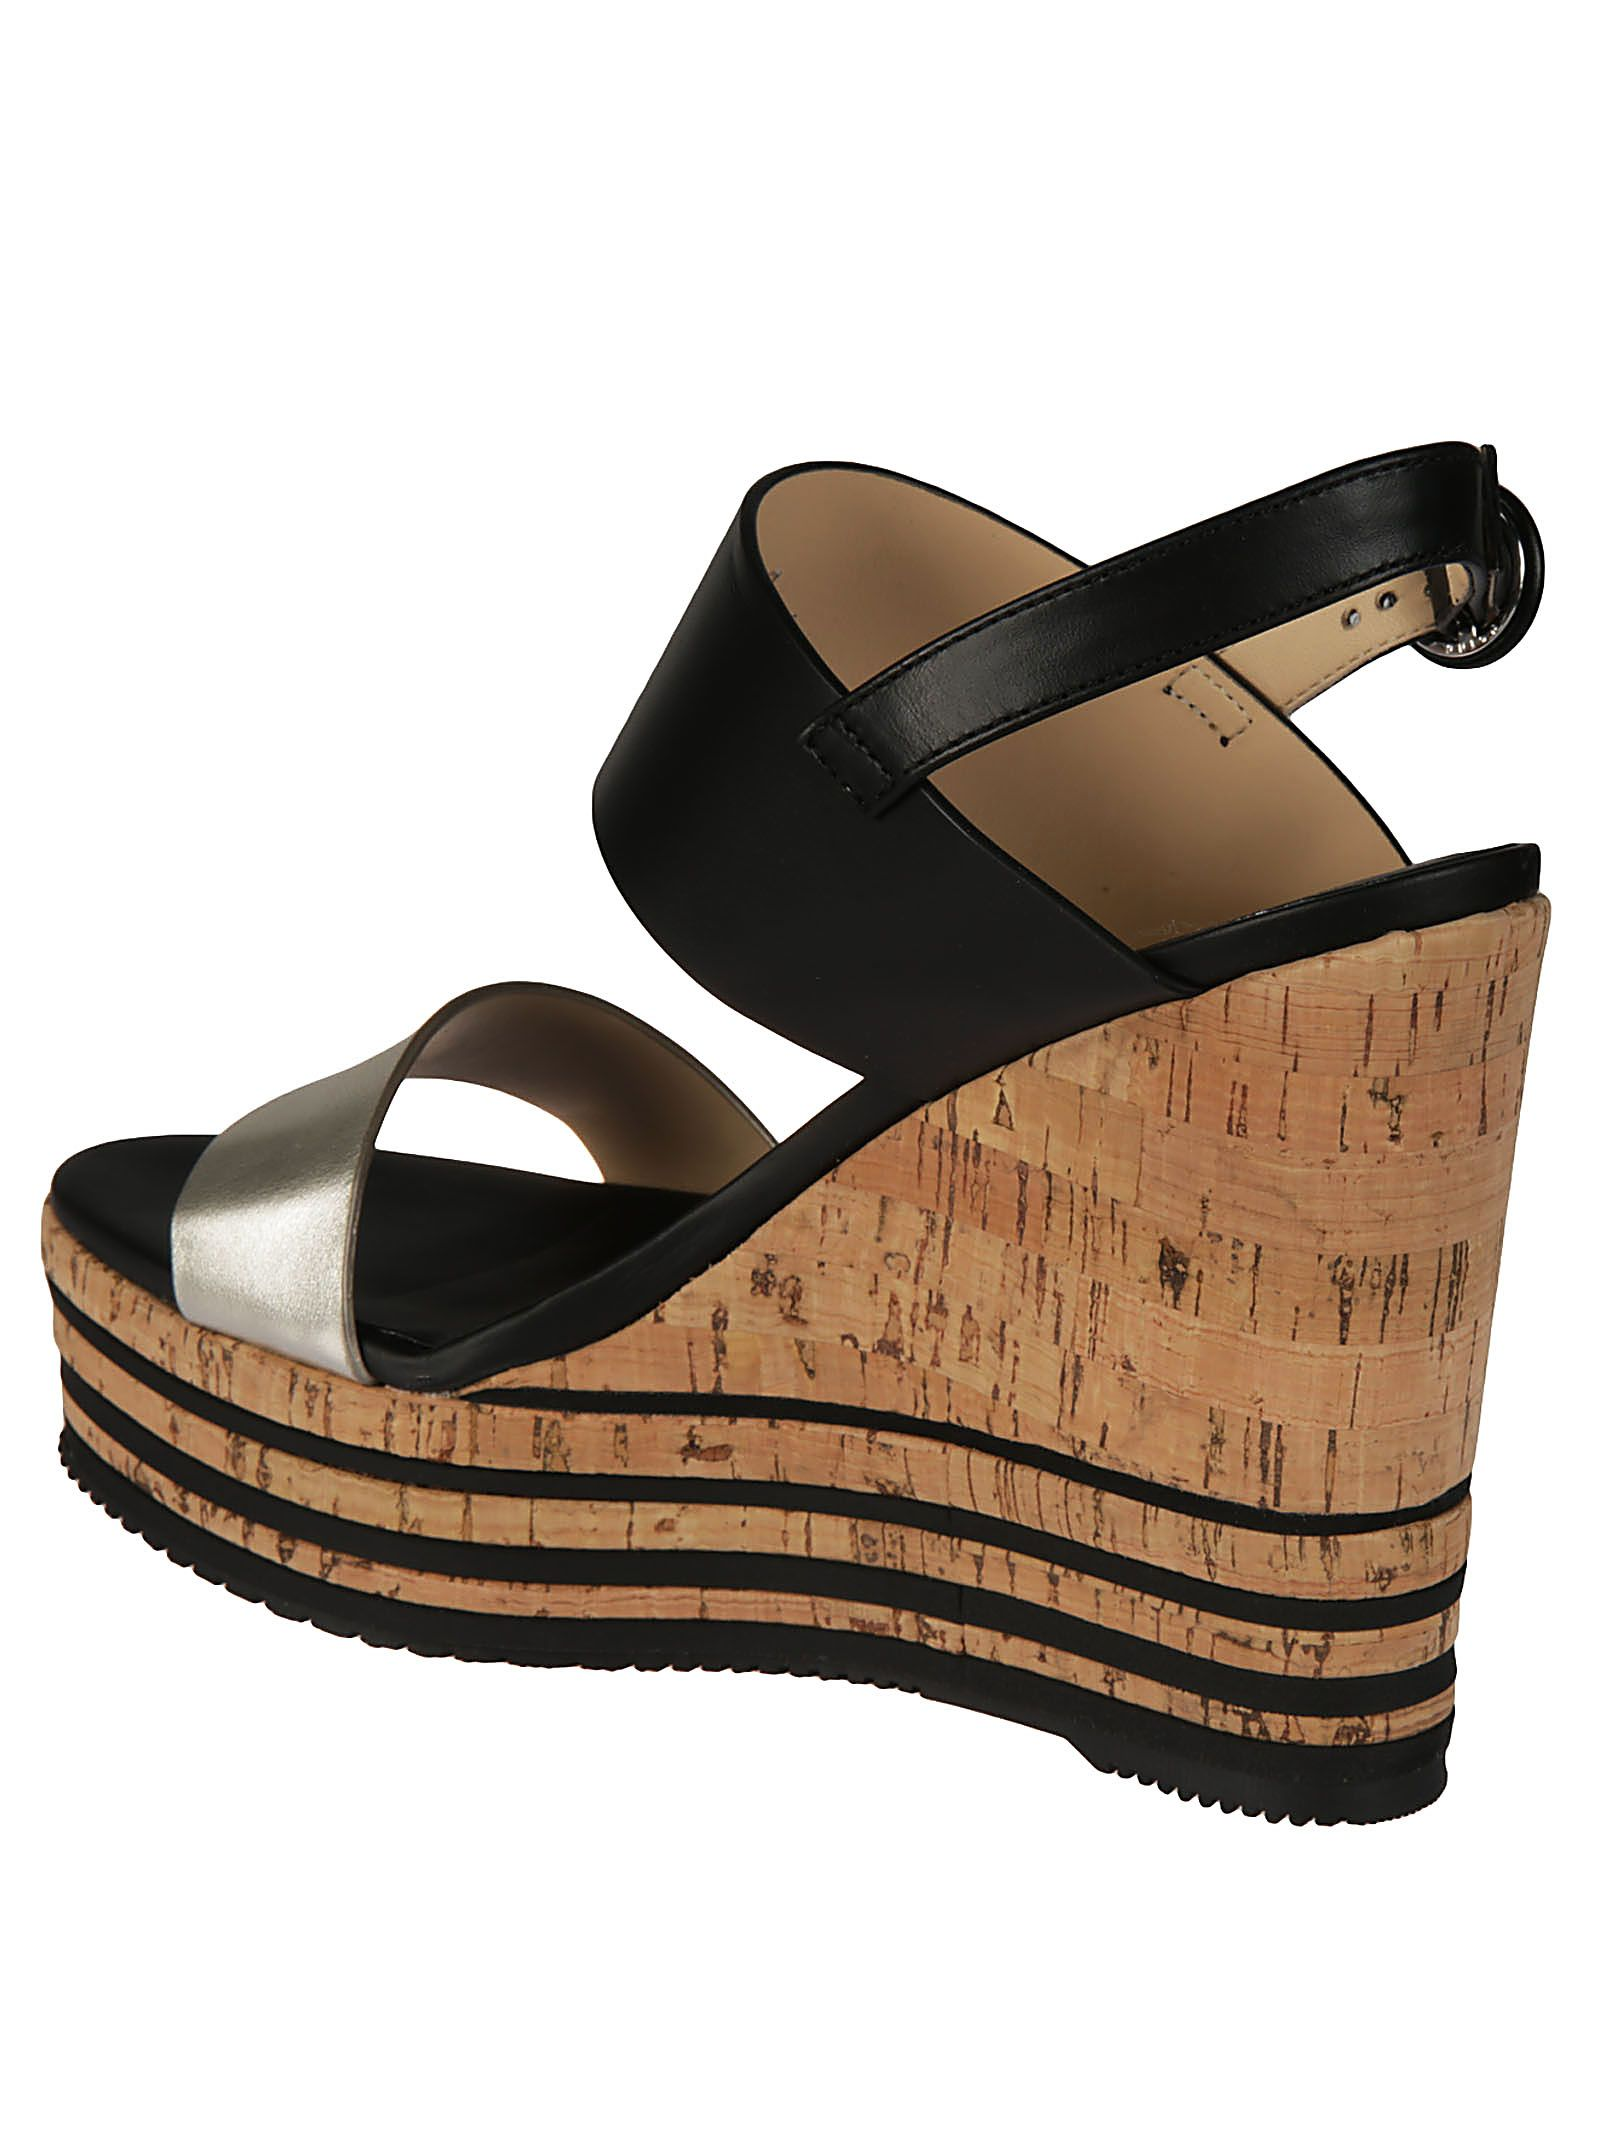 2d0575943fb7 Hogan Hogan Striped Cork Platform Sandals - Gray - 10600500